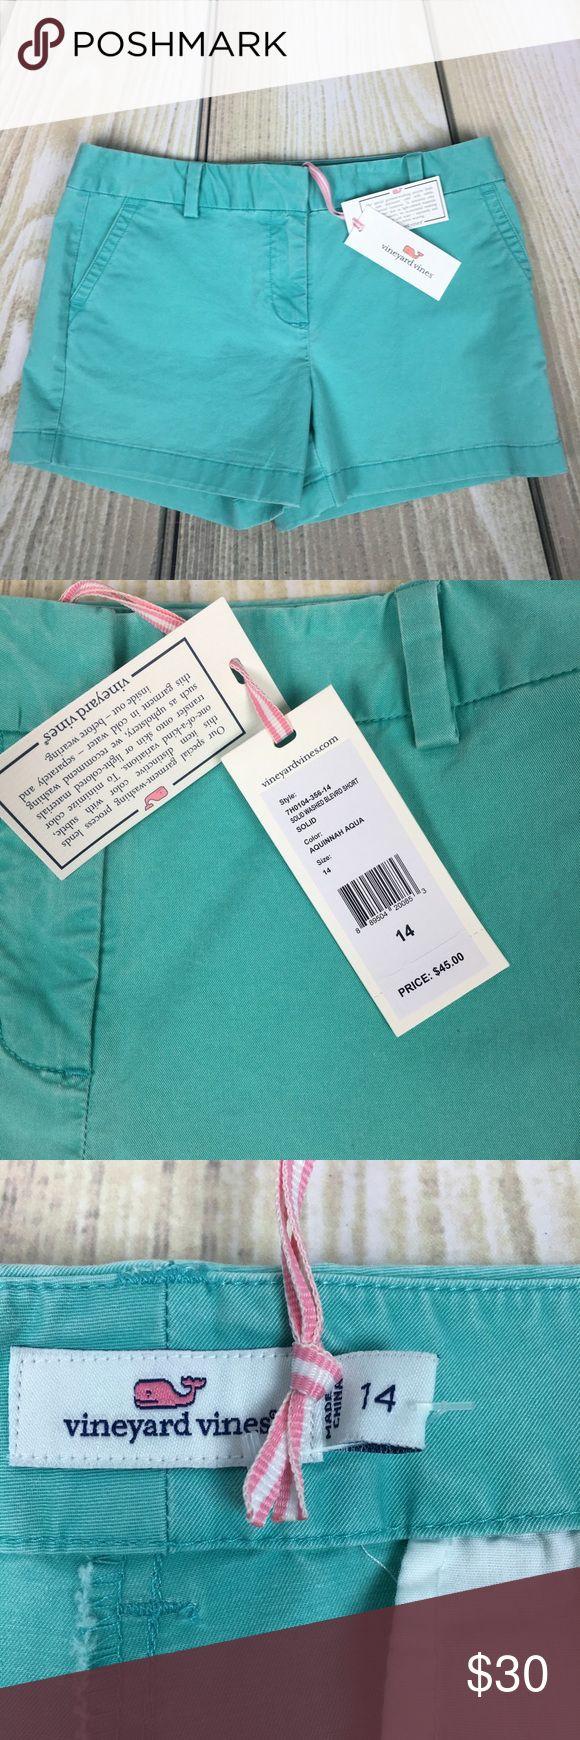 Vineyard Vines Aqua Boulevard Shorts size 14 NWT New with tags. Gorgeous vineyard vines aqua shorts size 14.   Retails $45 Vineyard Vines Shorts